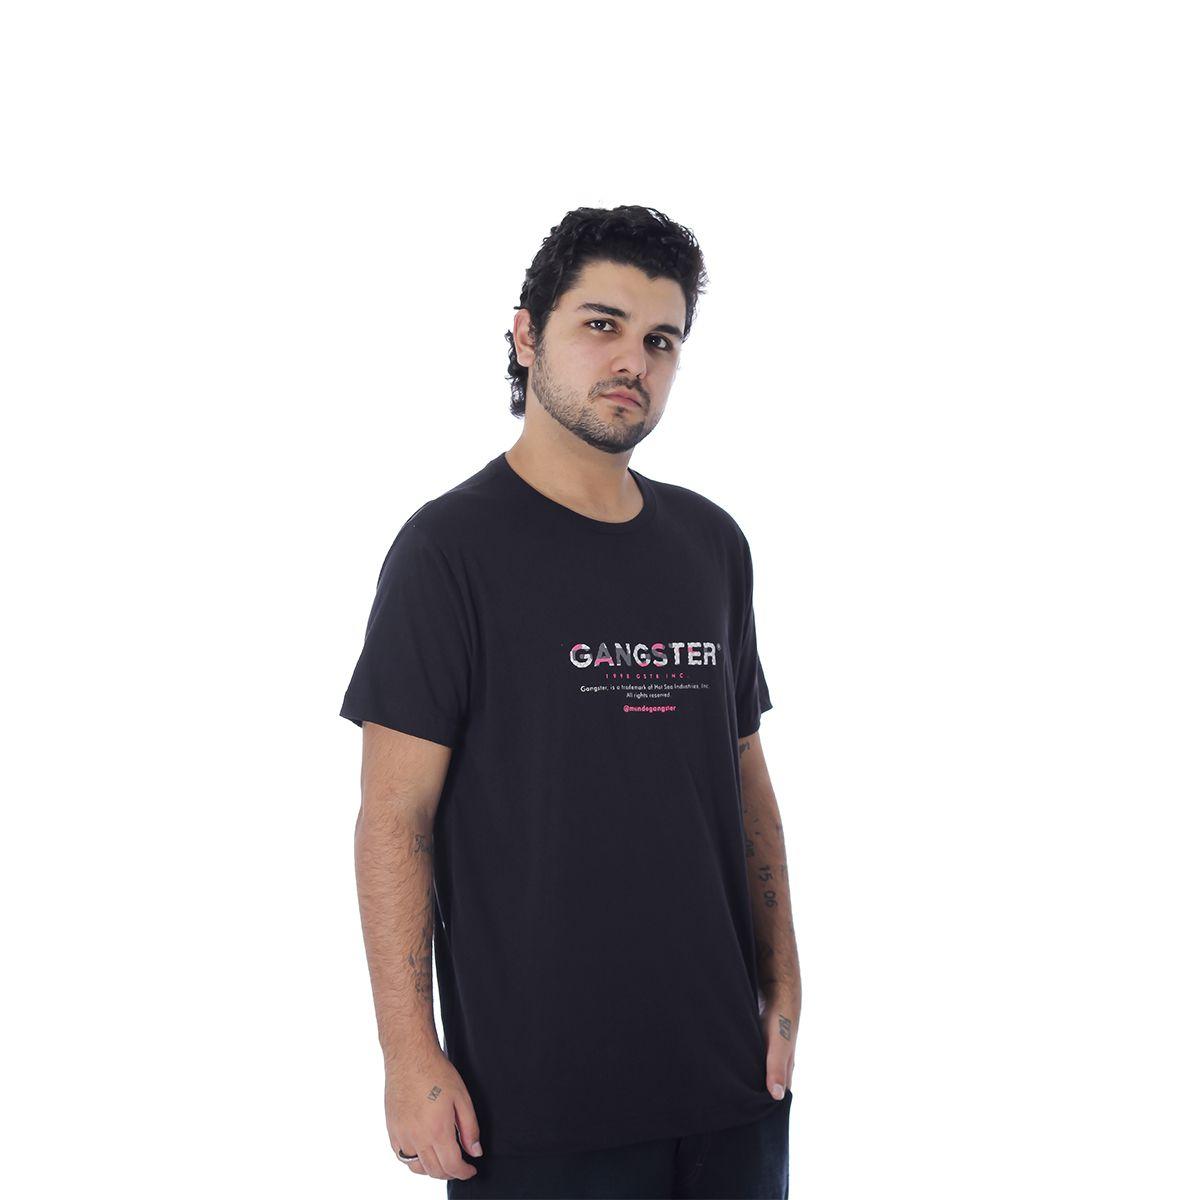 Camiseta Masculina Estampada Gangster 10.01.9988